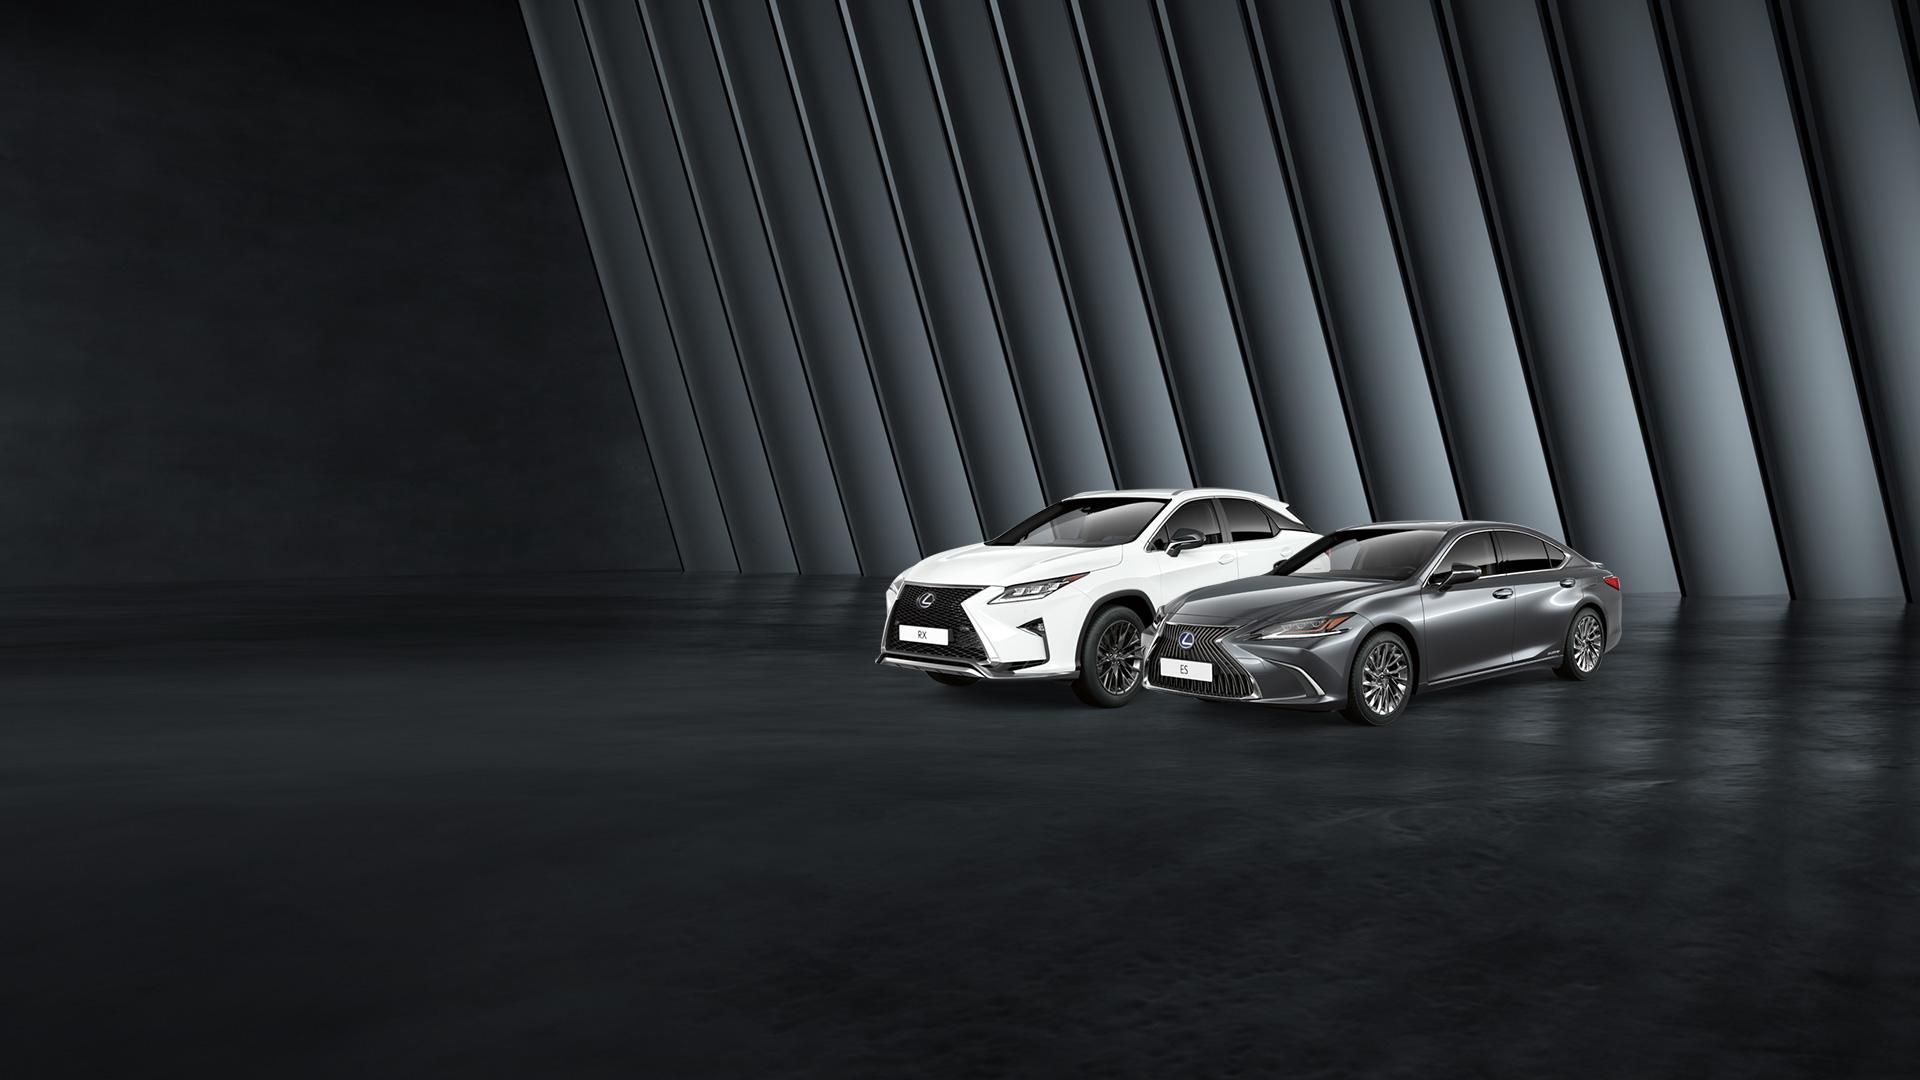 1920x1080 Lexus RX ES v4